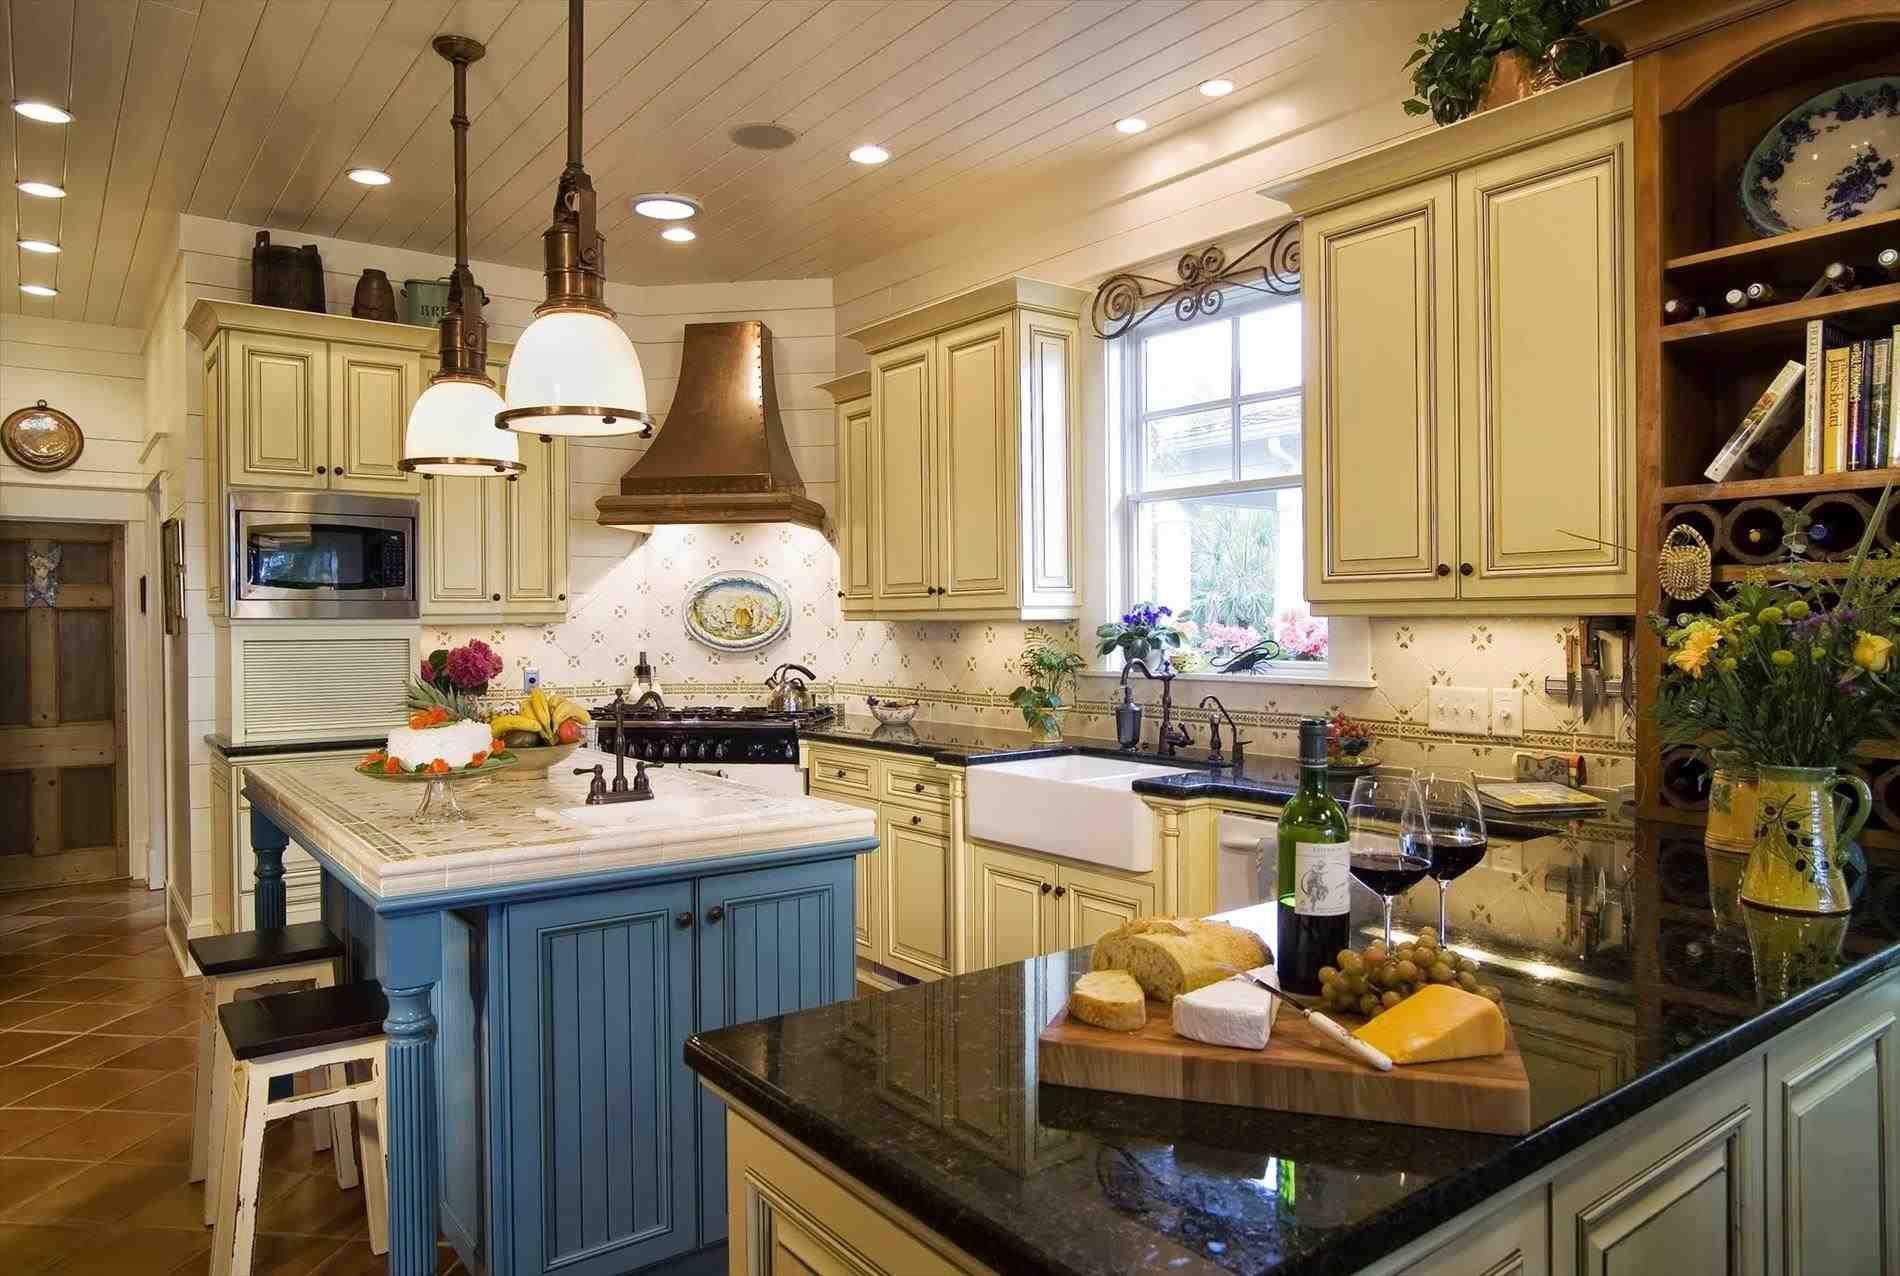 New post rustic blue kitchen cabinets decors ideas pinterest